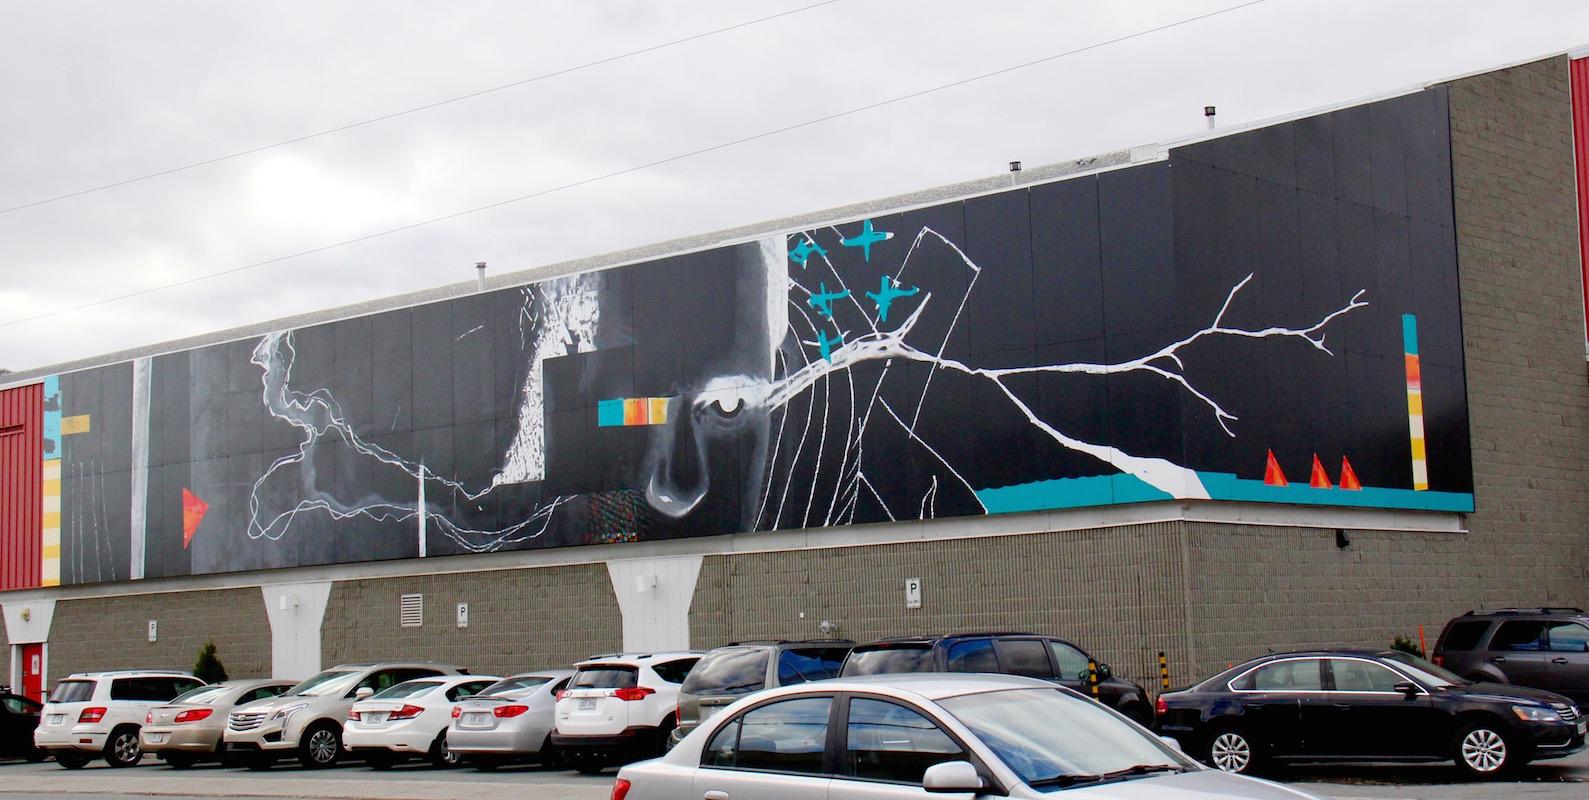 murale art public Rouyn-Noranda Karine Berthiaume